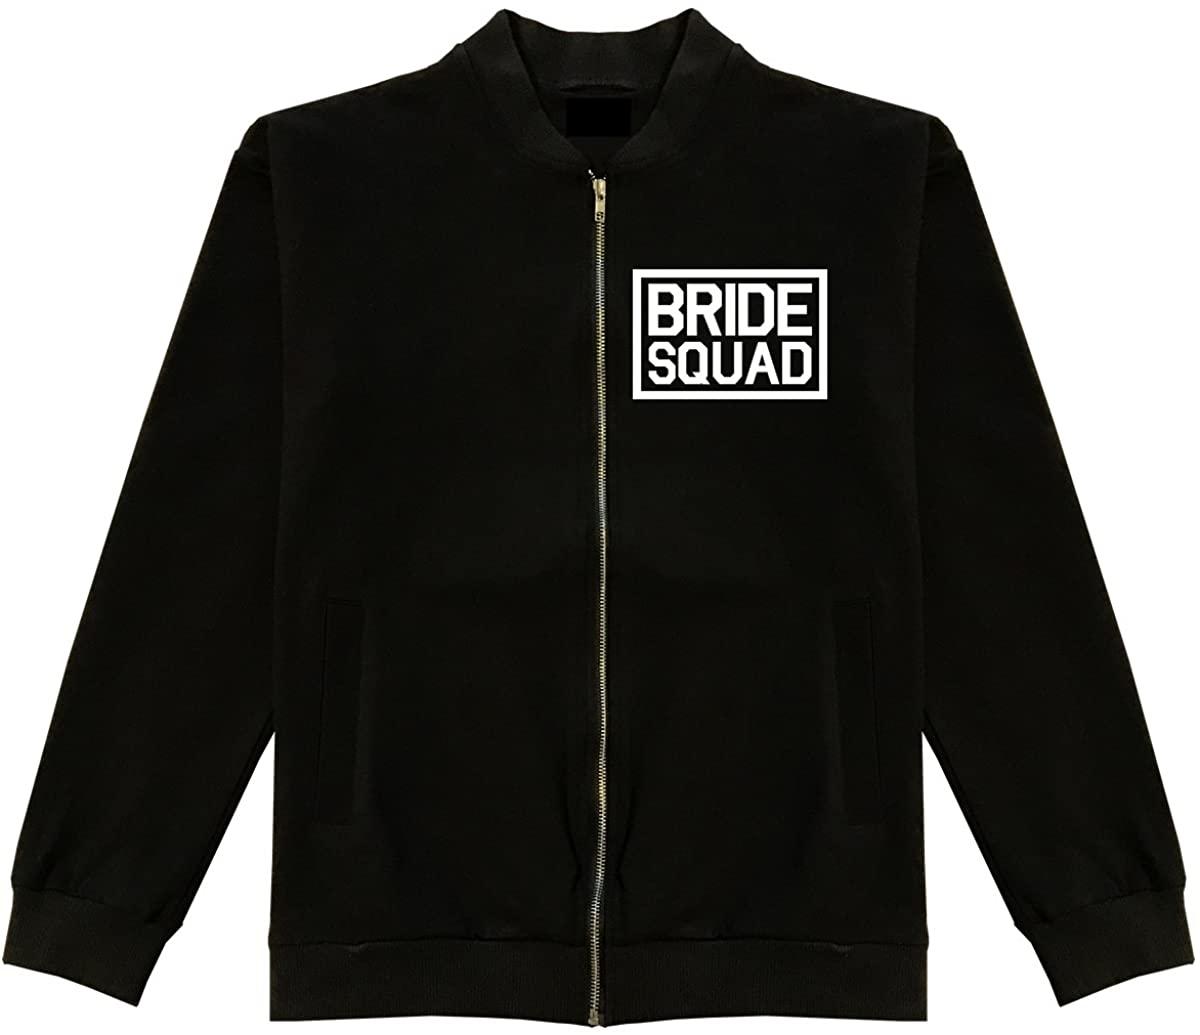 Kings Of NY Bride Squad Bachlorette Party Bomber Jacket